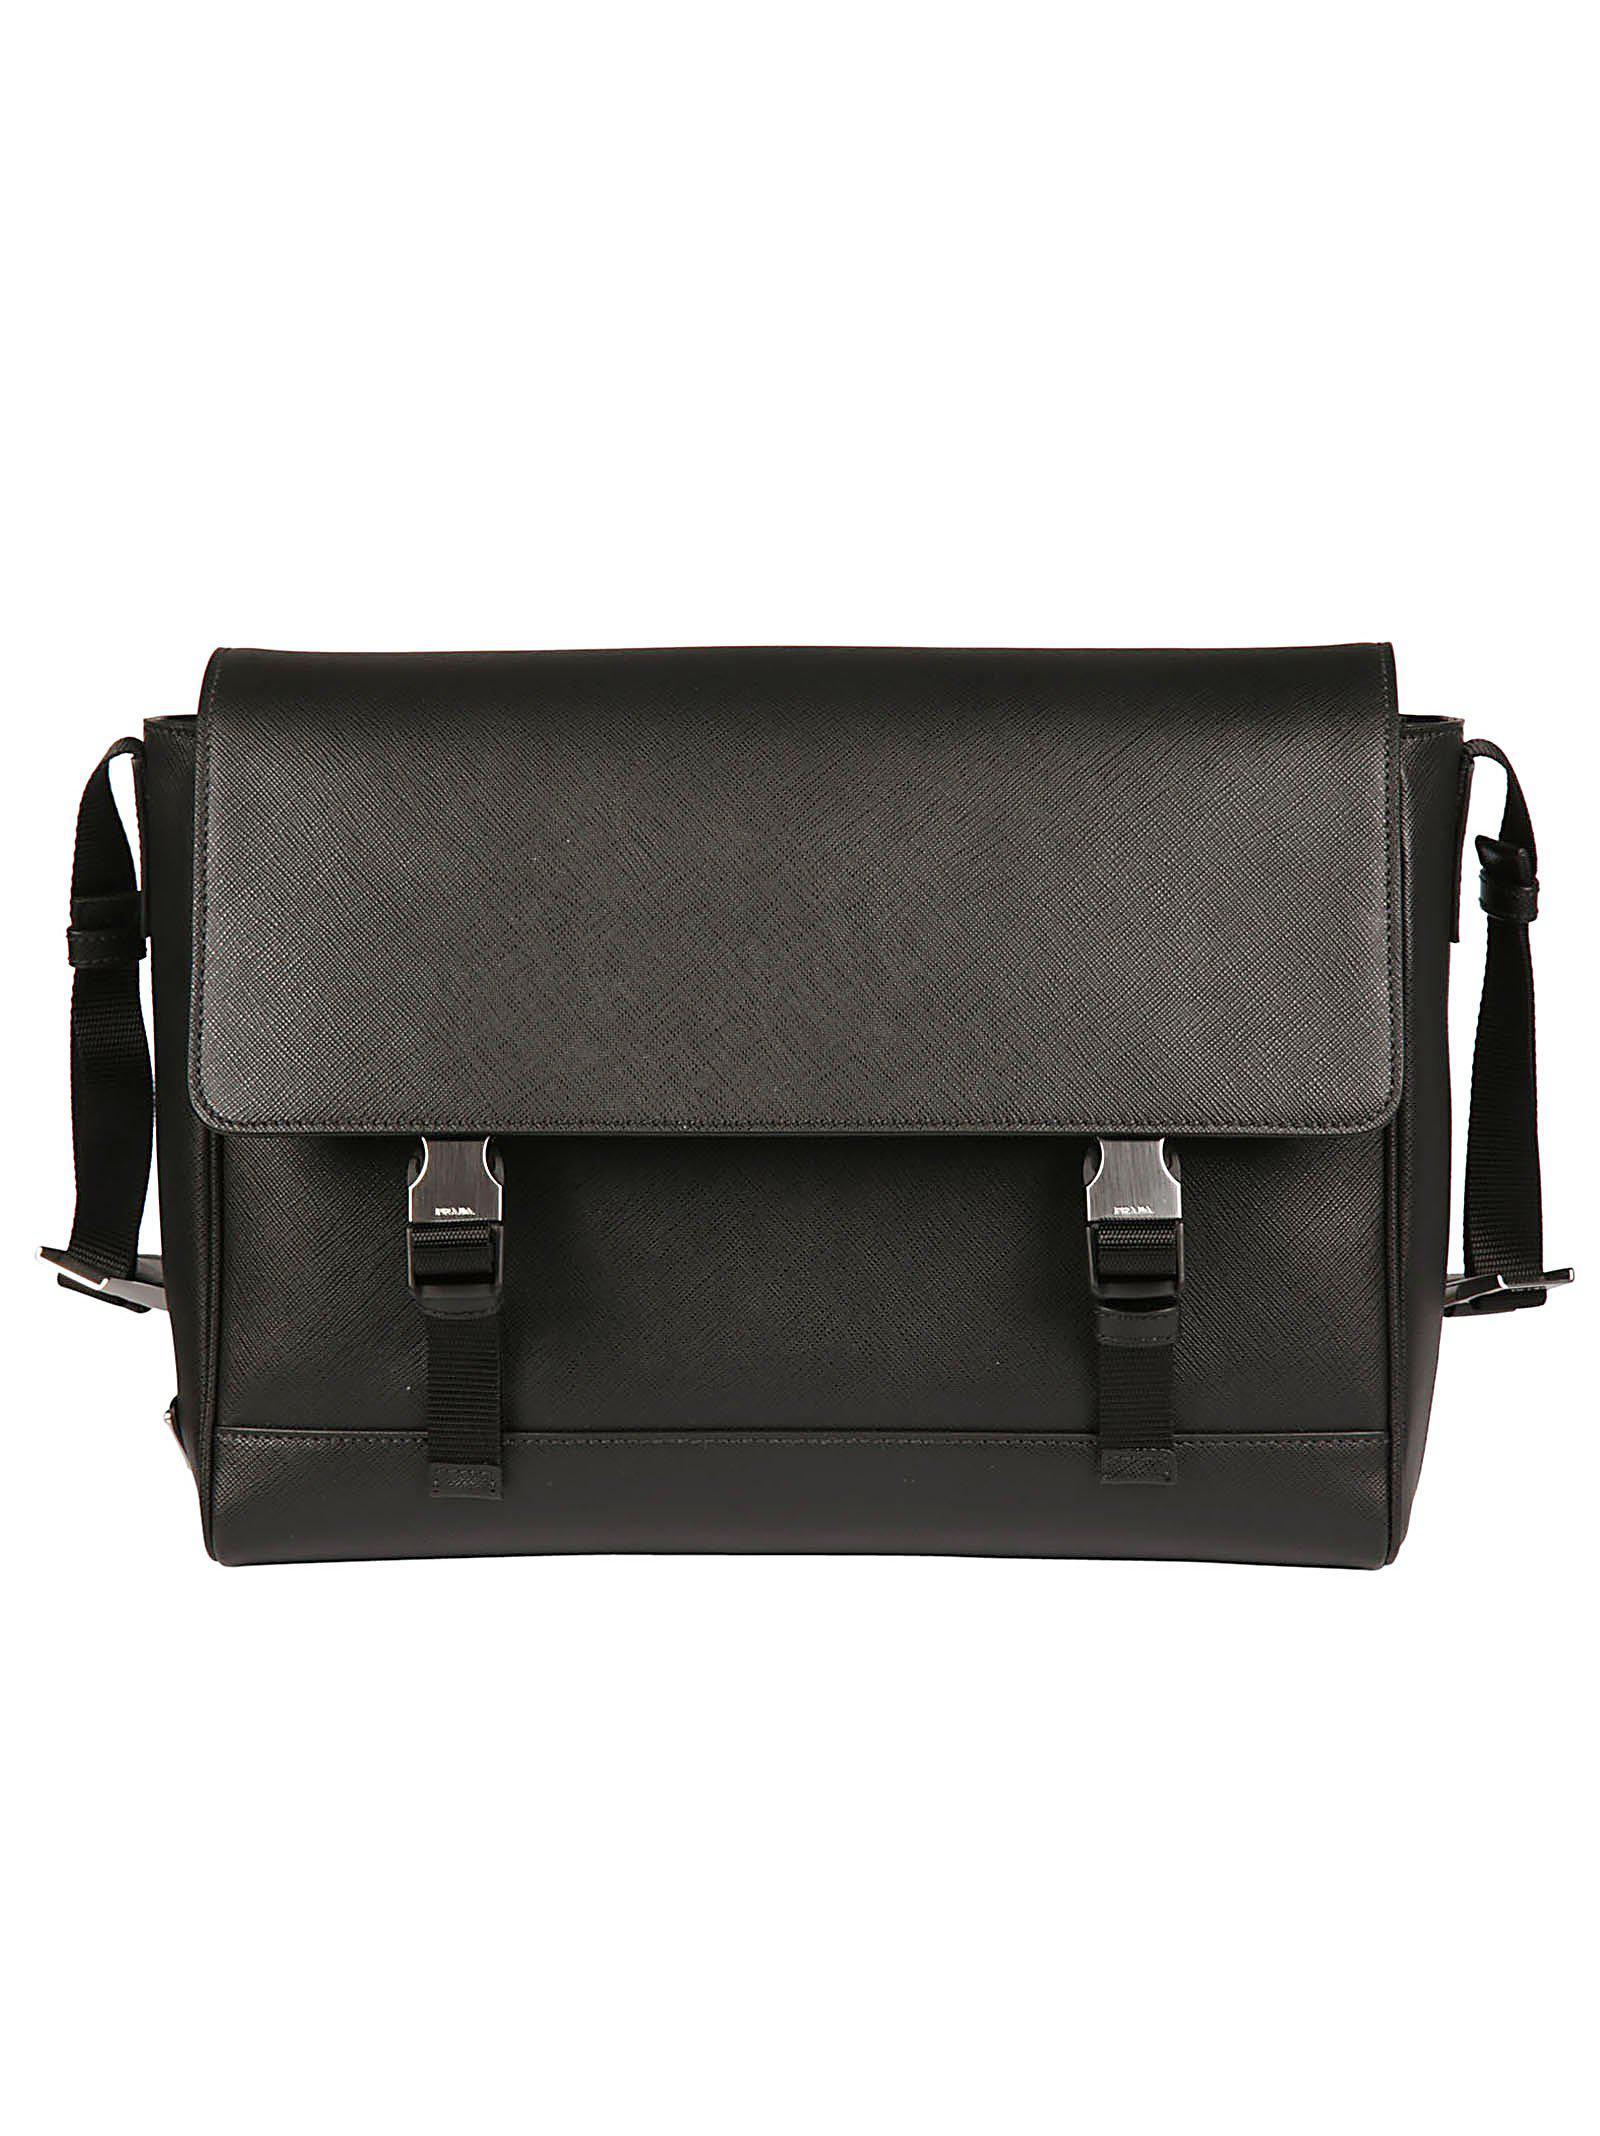 Prada Logo Double Clipped Shoulder Bag in Black for Men - Lyst c1a45e3c13088